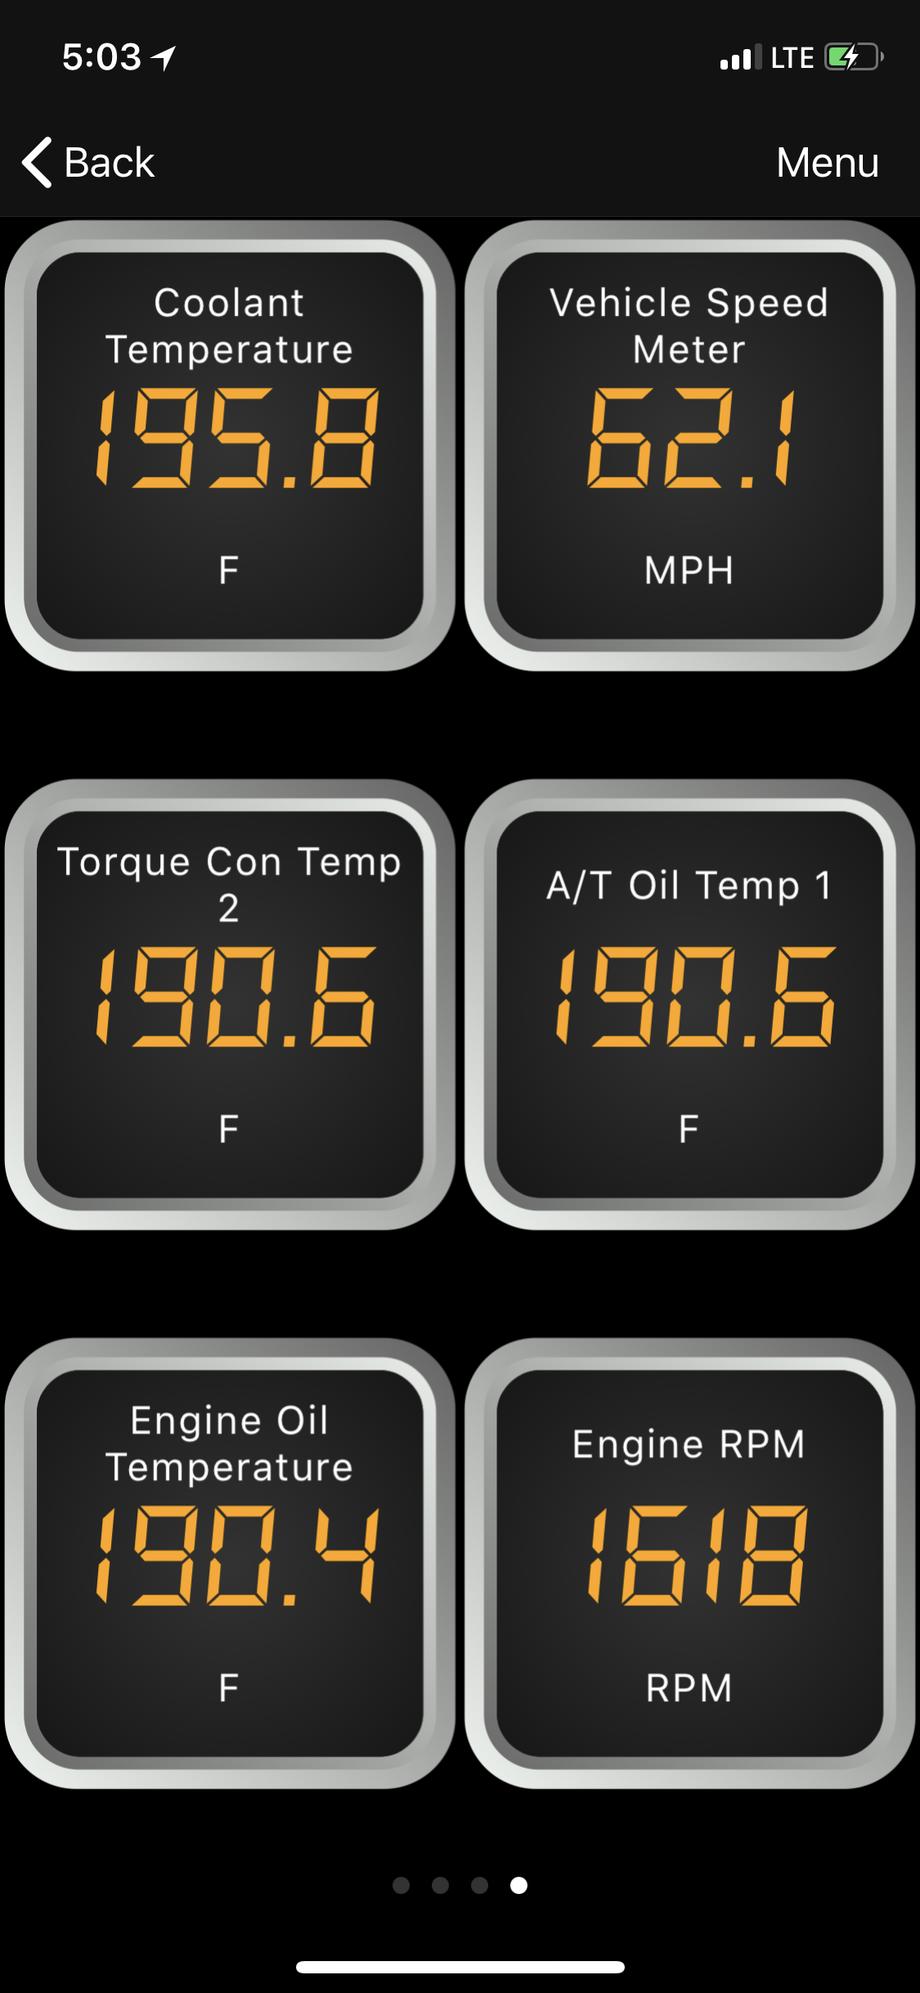 Anyone pulling transmission temps via OBD? - ClubLexus - Lexus Forum